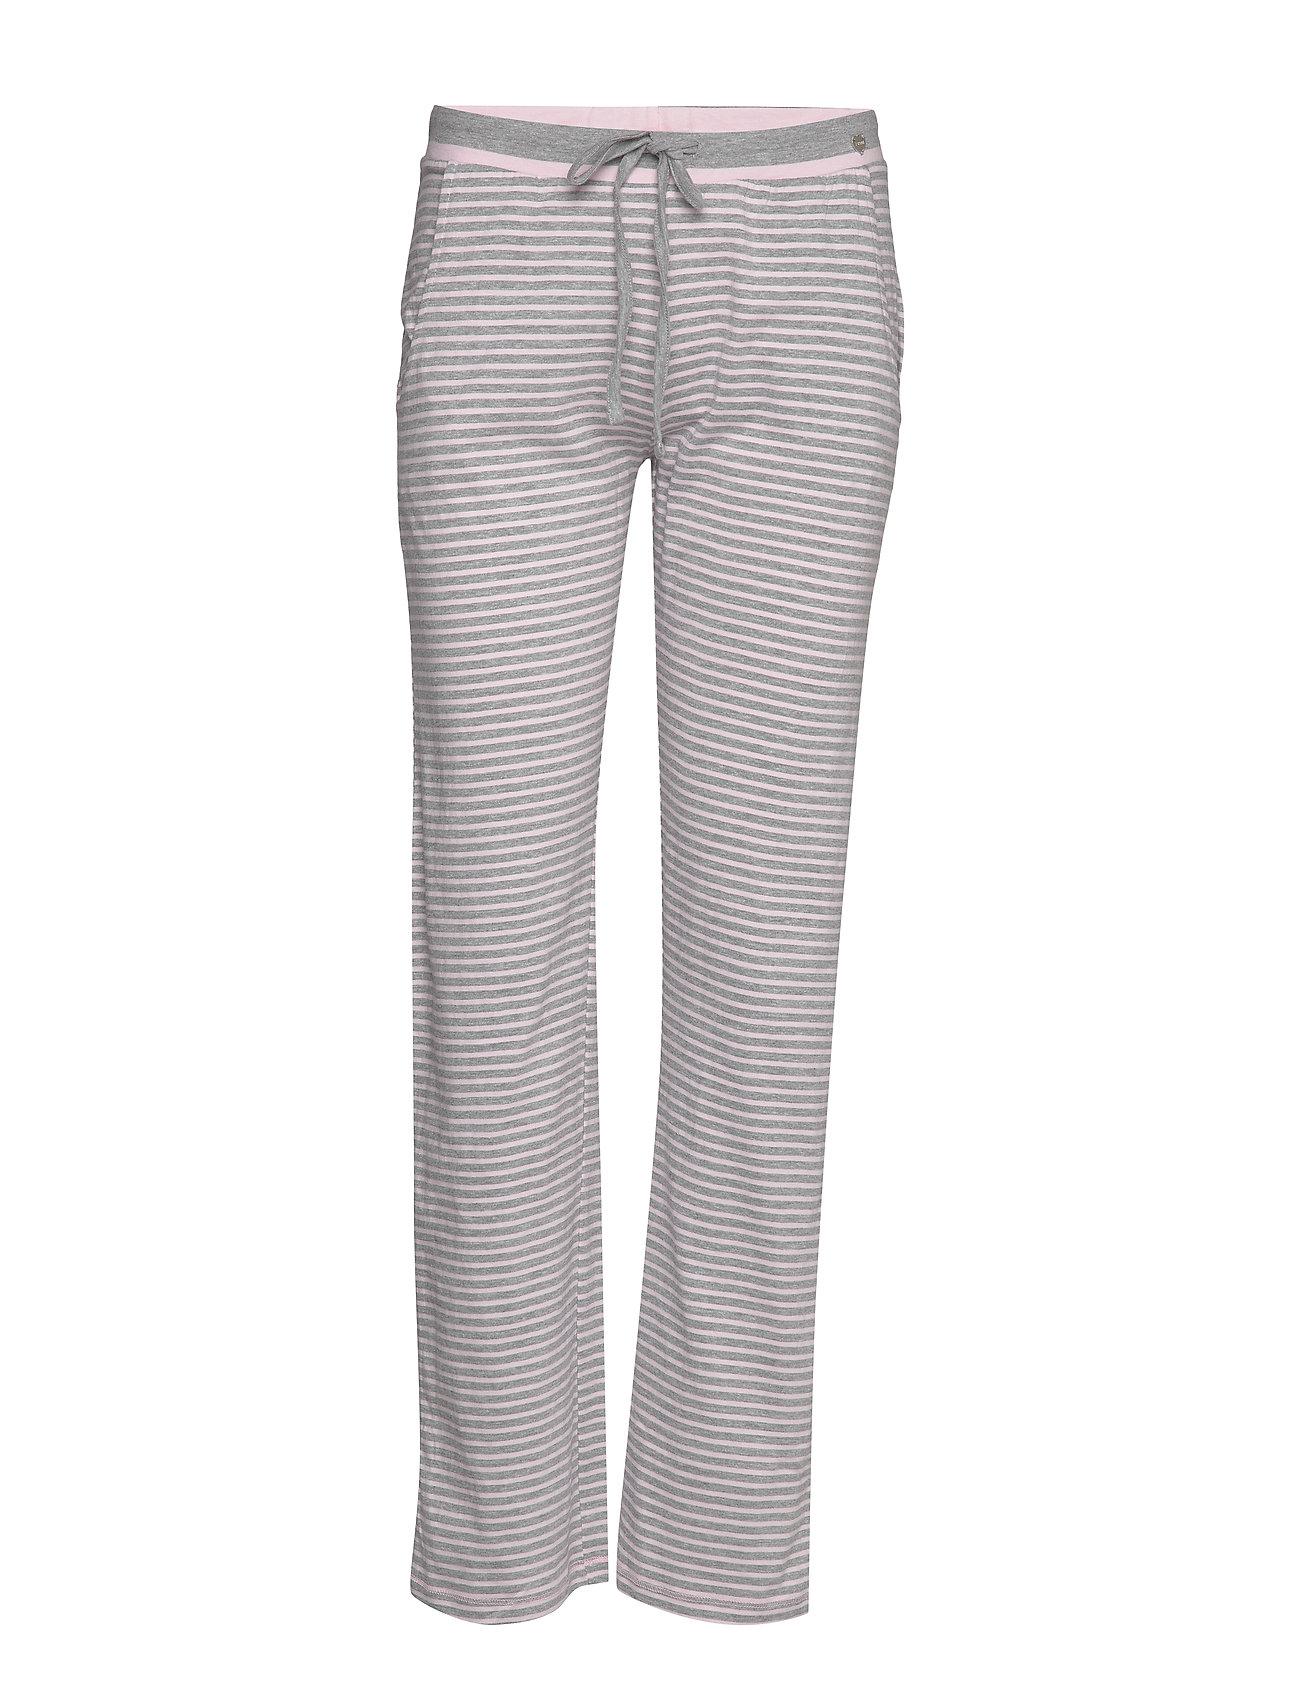 Esprit Bodywear Women Nightpants - PASTEL PINK